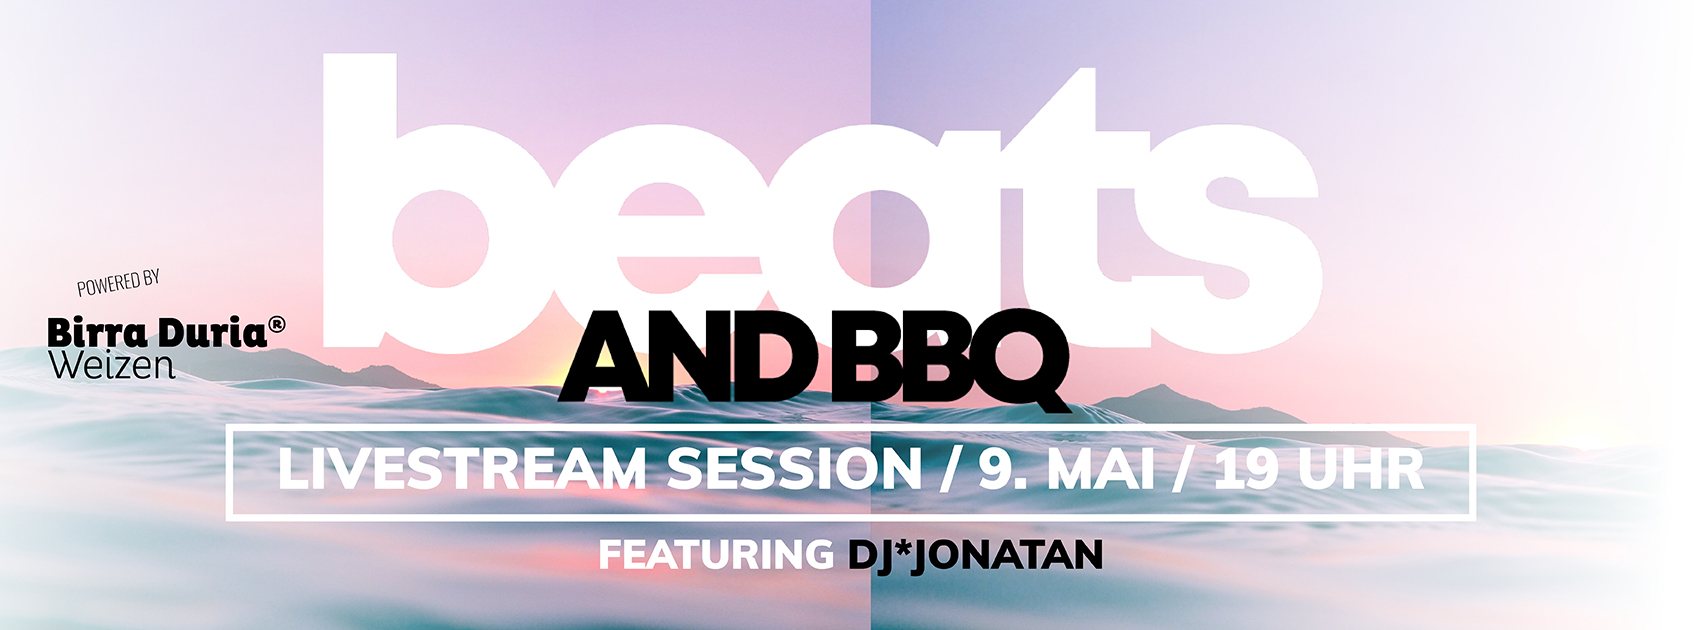 beatsnbbq-facebookheader-livestream-web-001